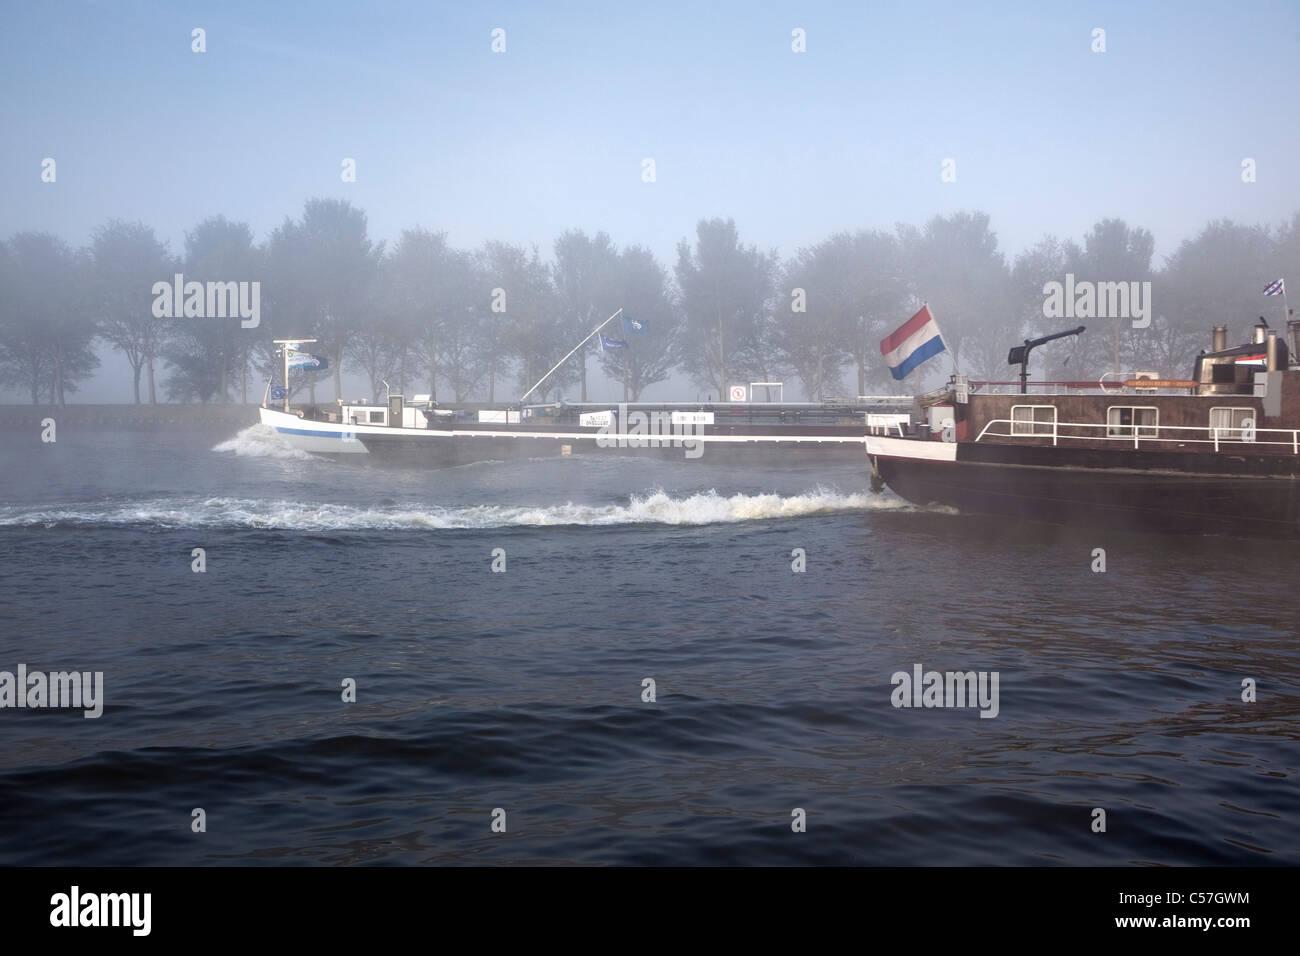 The Netherlands, Nigtevecht, Cargo ships on canal called Amsterdam Rijn Kanaal. - Stock Image